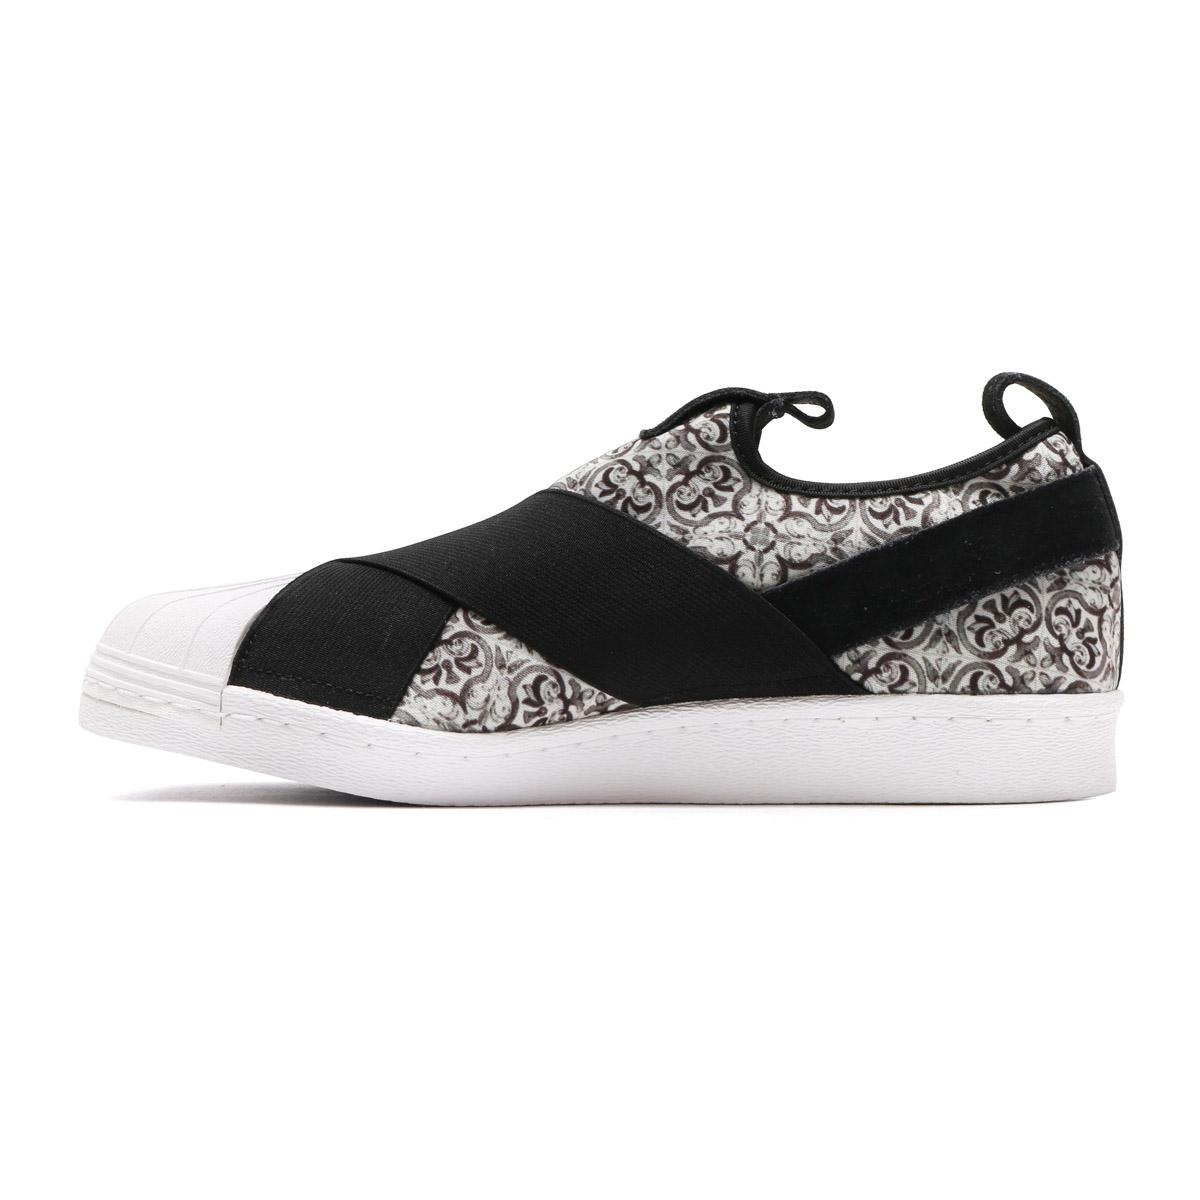 super popular 50a1b 83dfe adidas Originals WMNS Superstar Slip On Sneakers - SPORT ...